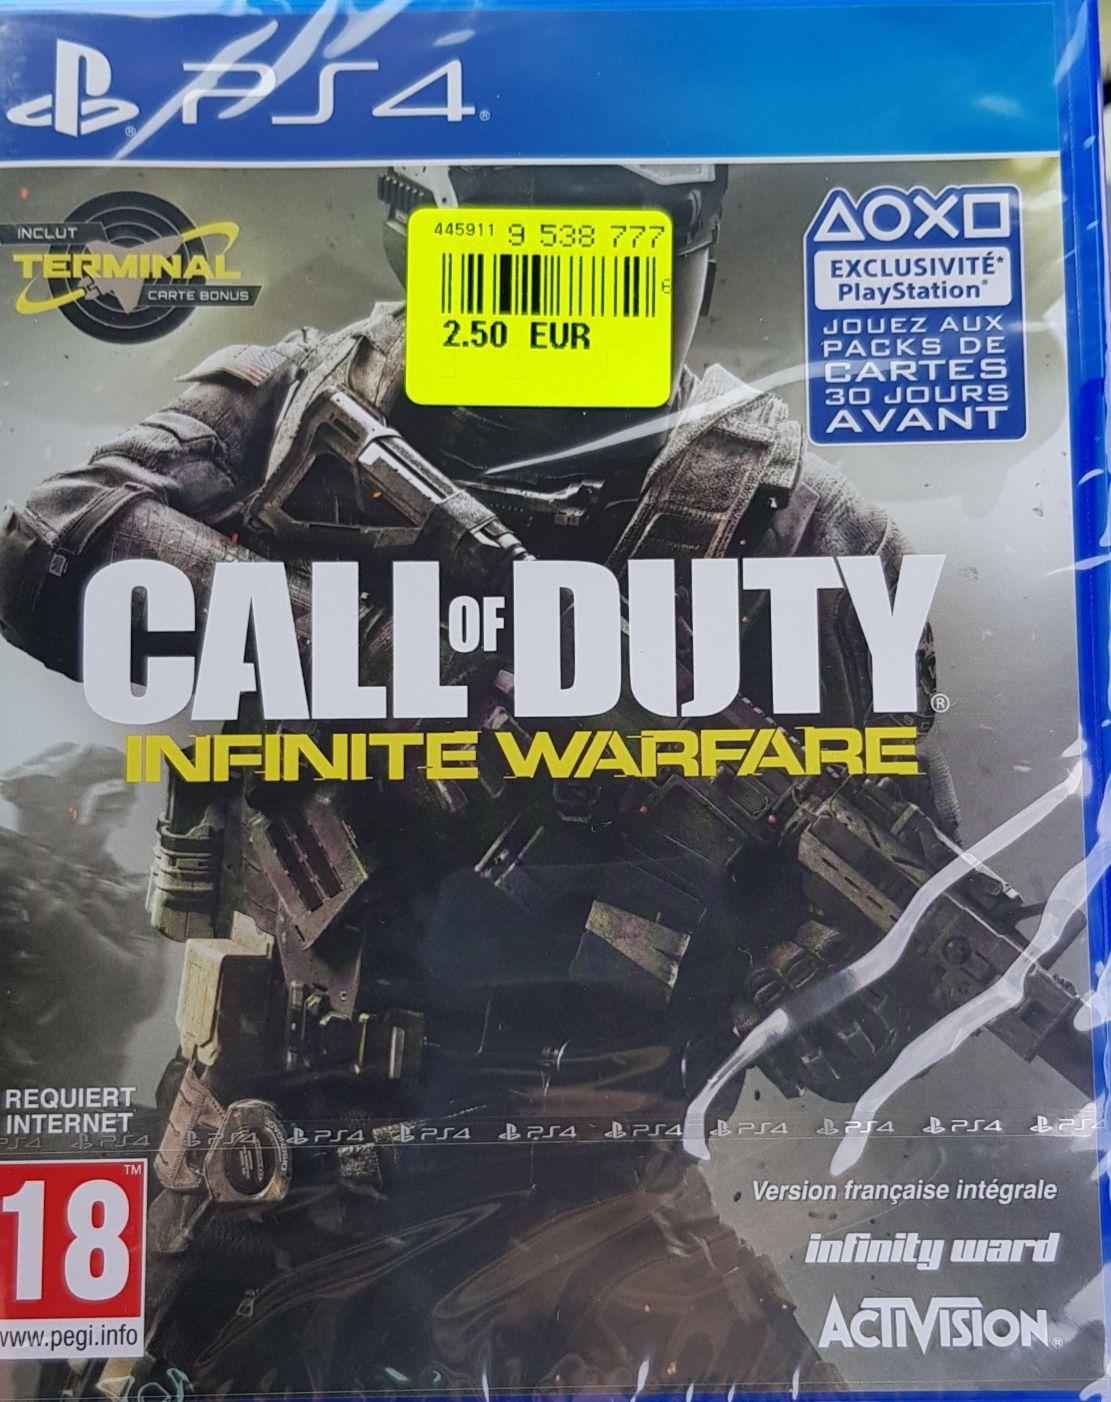 Call of Duty  Infinite Warfare sur PS4 ou Xbox One